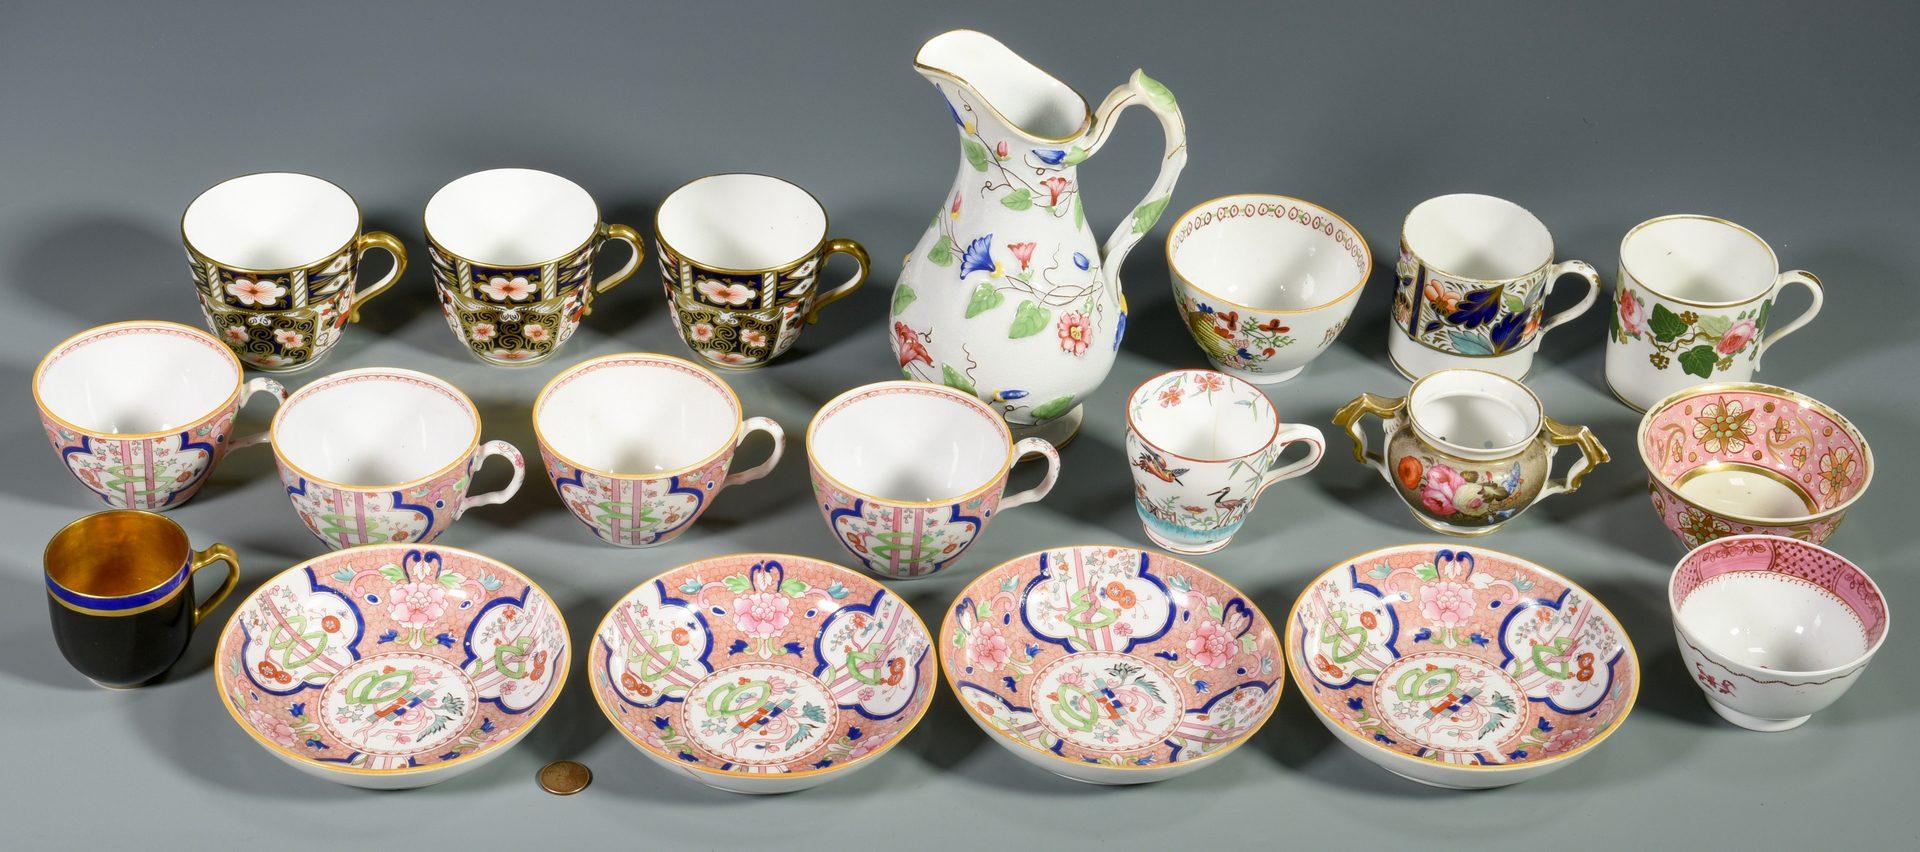 Lot 701: 16 Porcelain tea items, most English